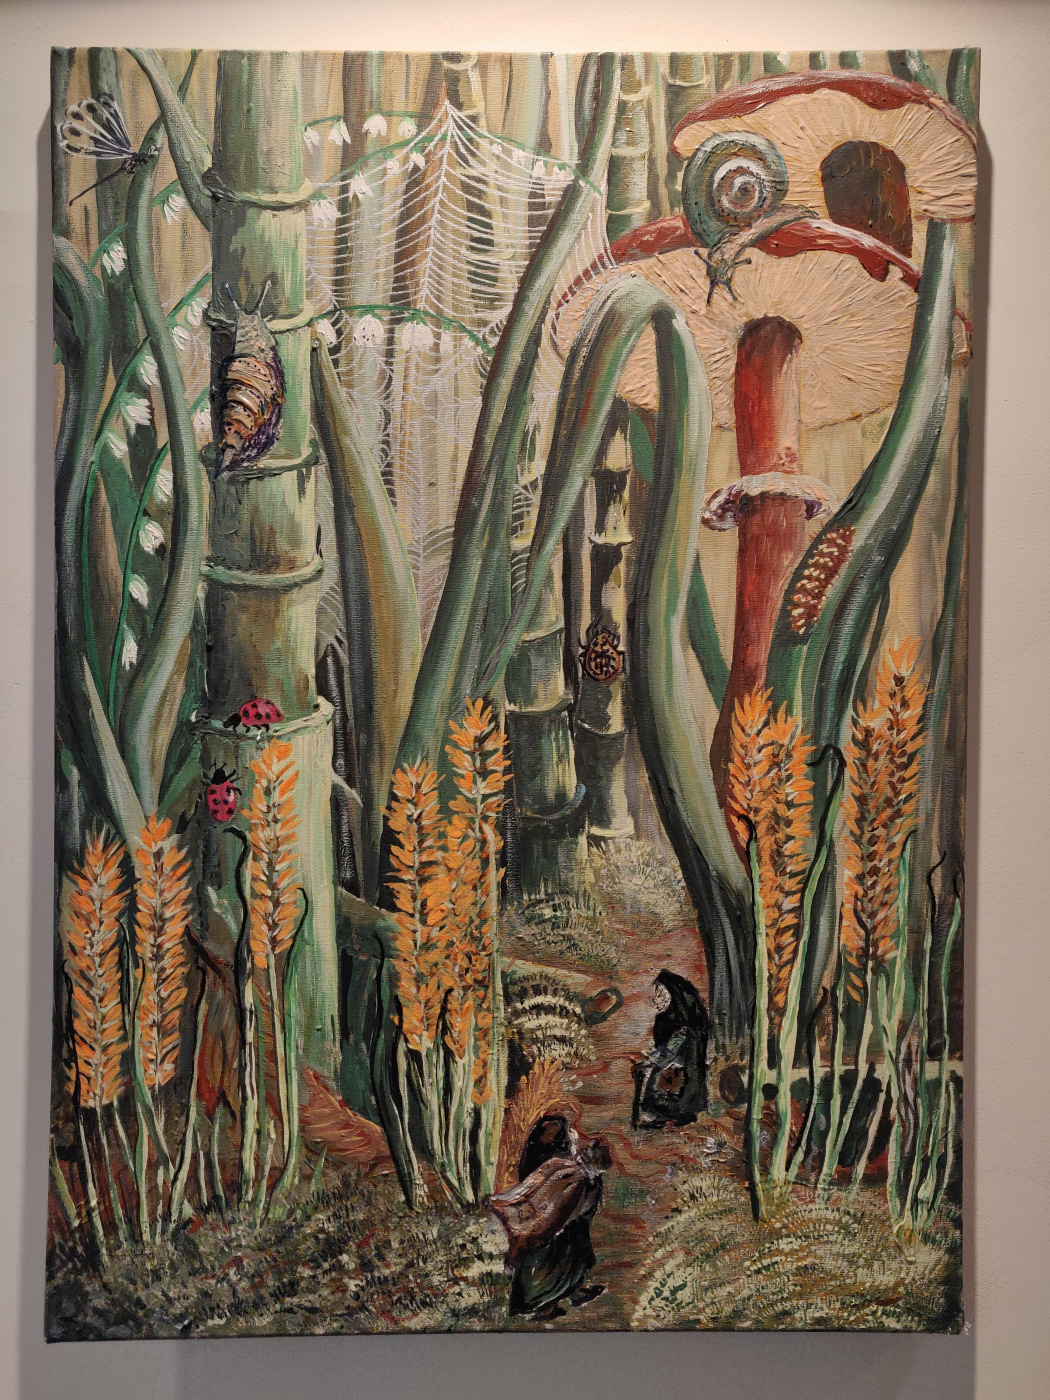 Nadin. Tall grass world